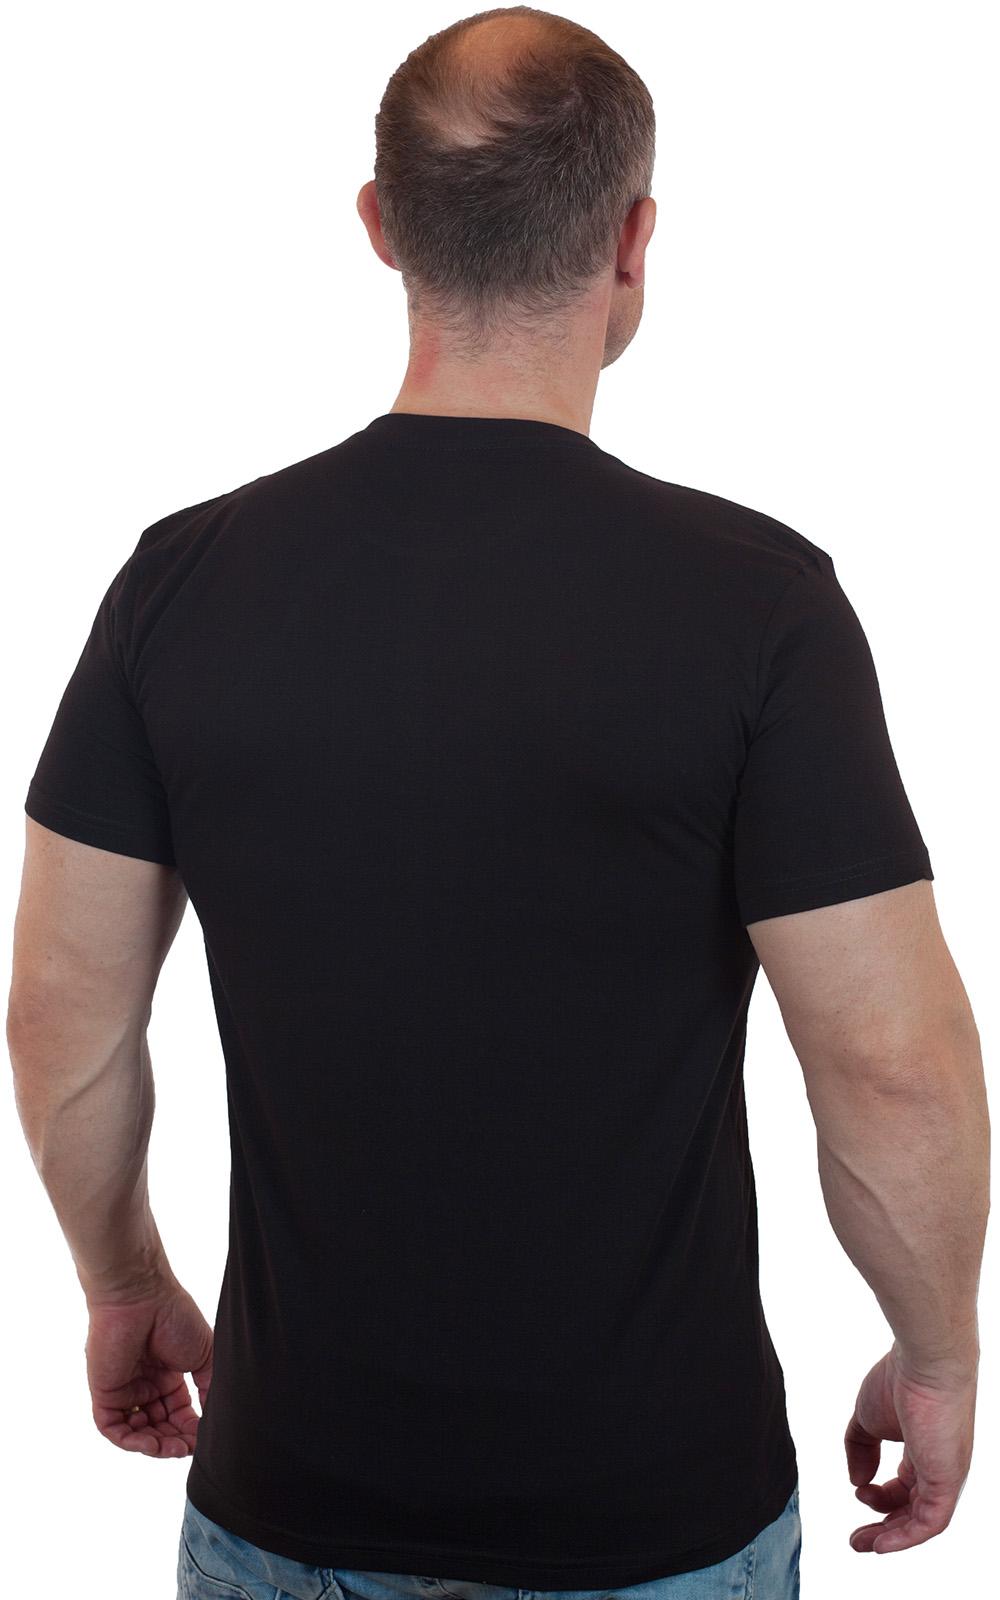 Черная мужская футболка ФСО - заказать онлайн